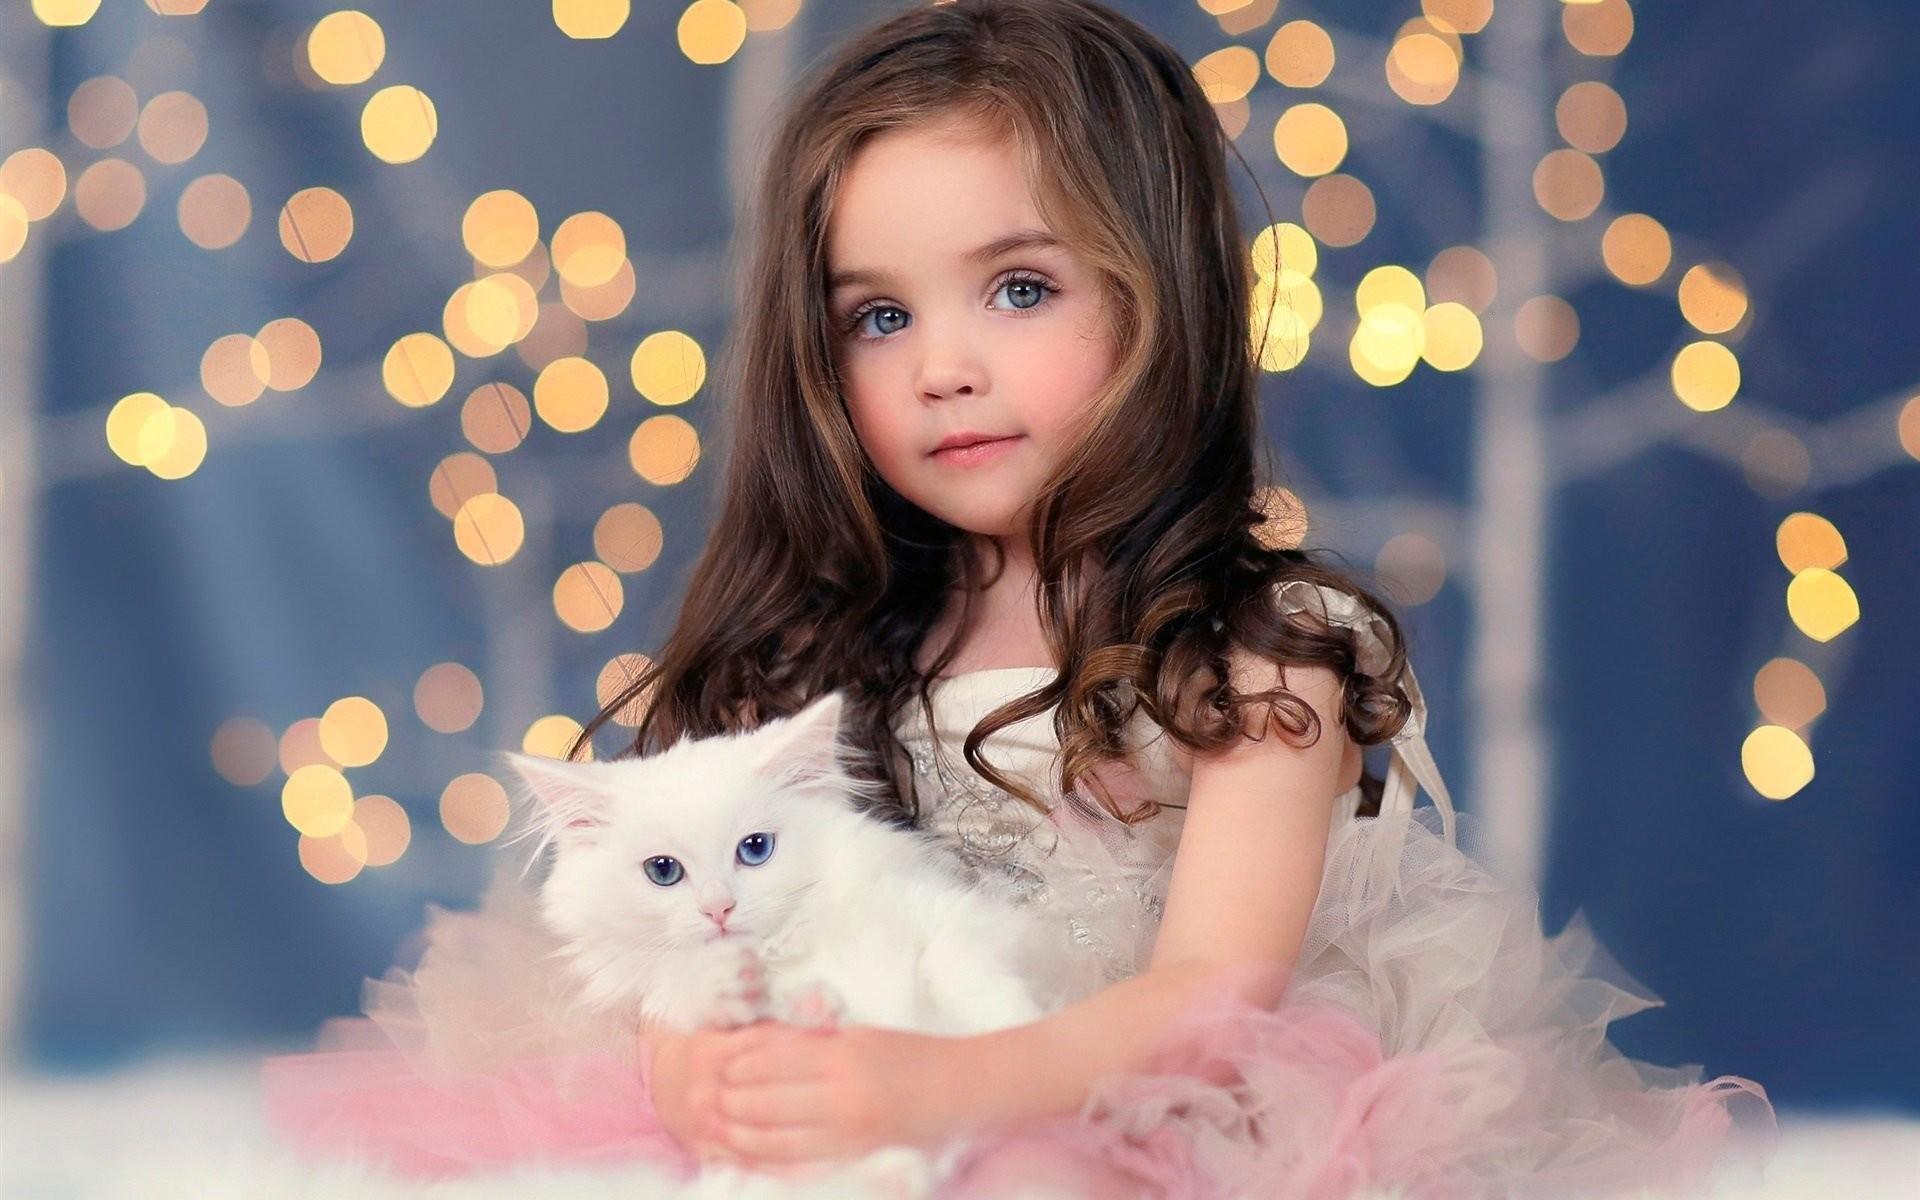 Res: 1920x1200, Children girl blonde blue eyes cat animal cute dress angel wallpaper |   | 800854 | WallpaperUP